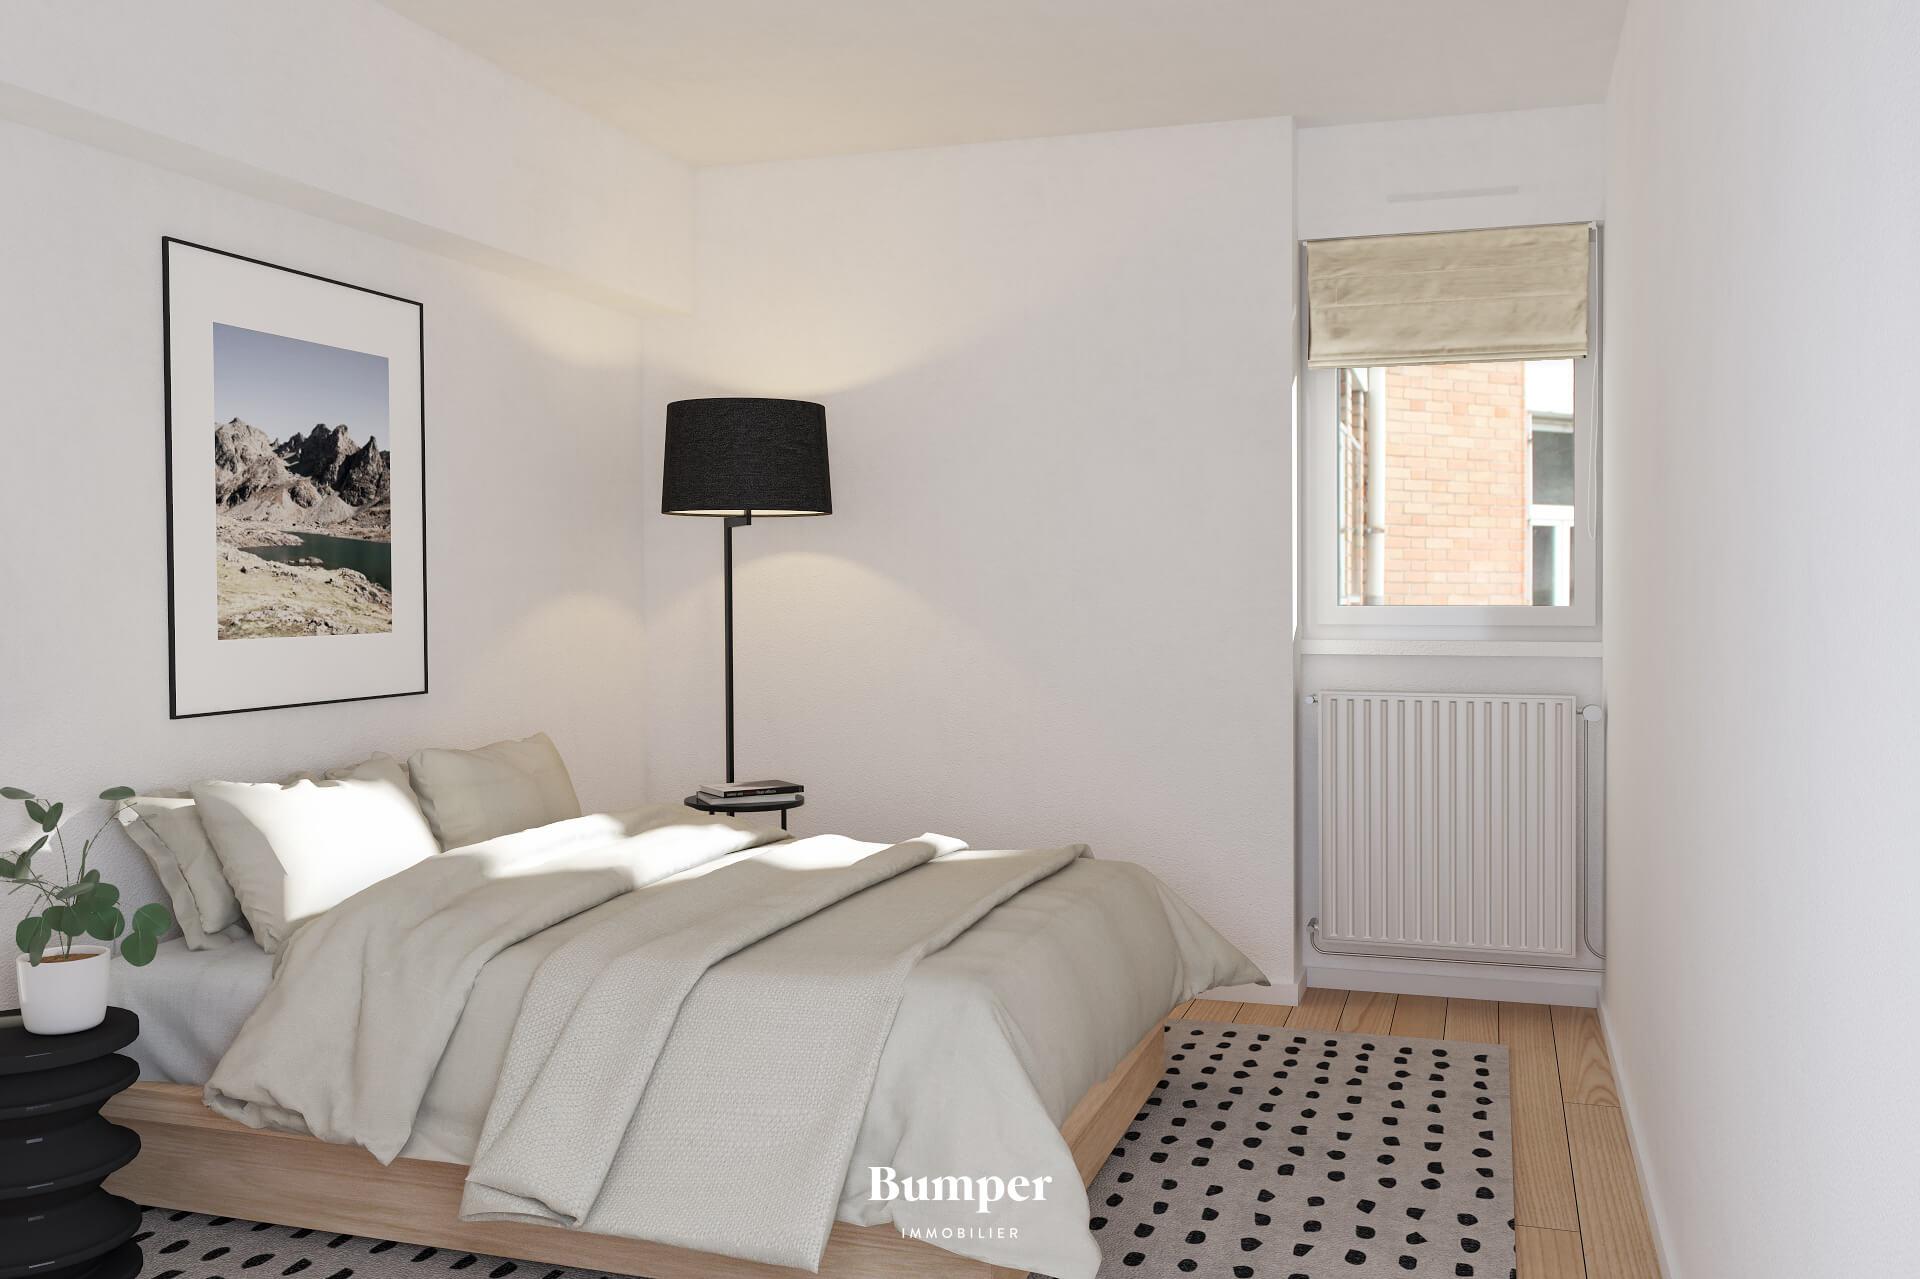 bumper-immobilier-rouen-1 copie.jpg